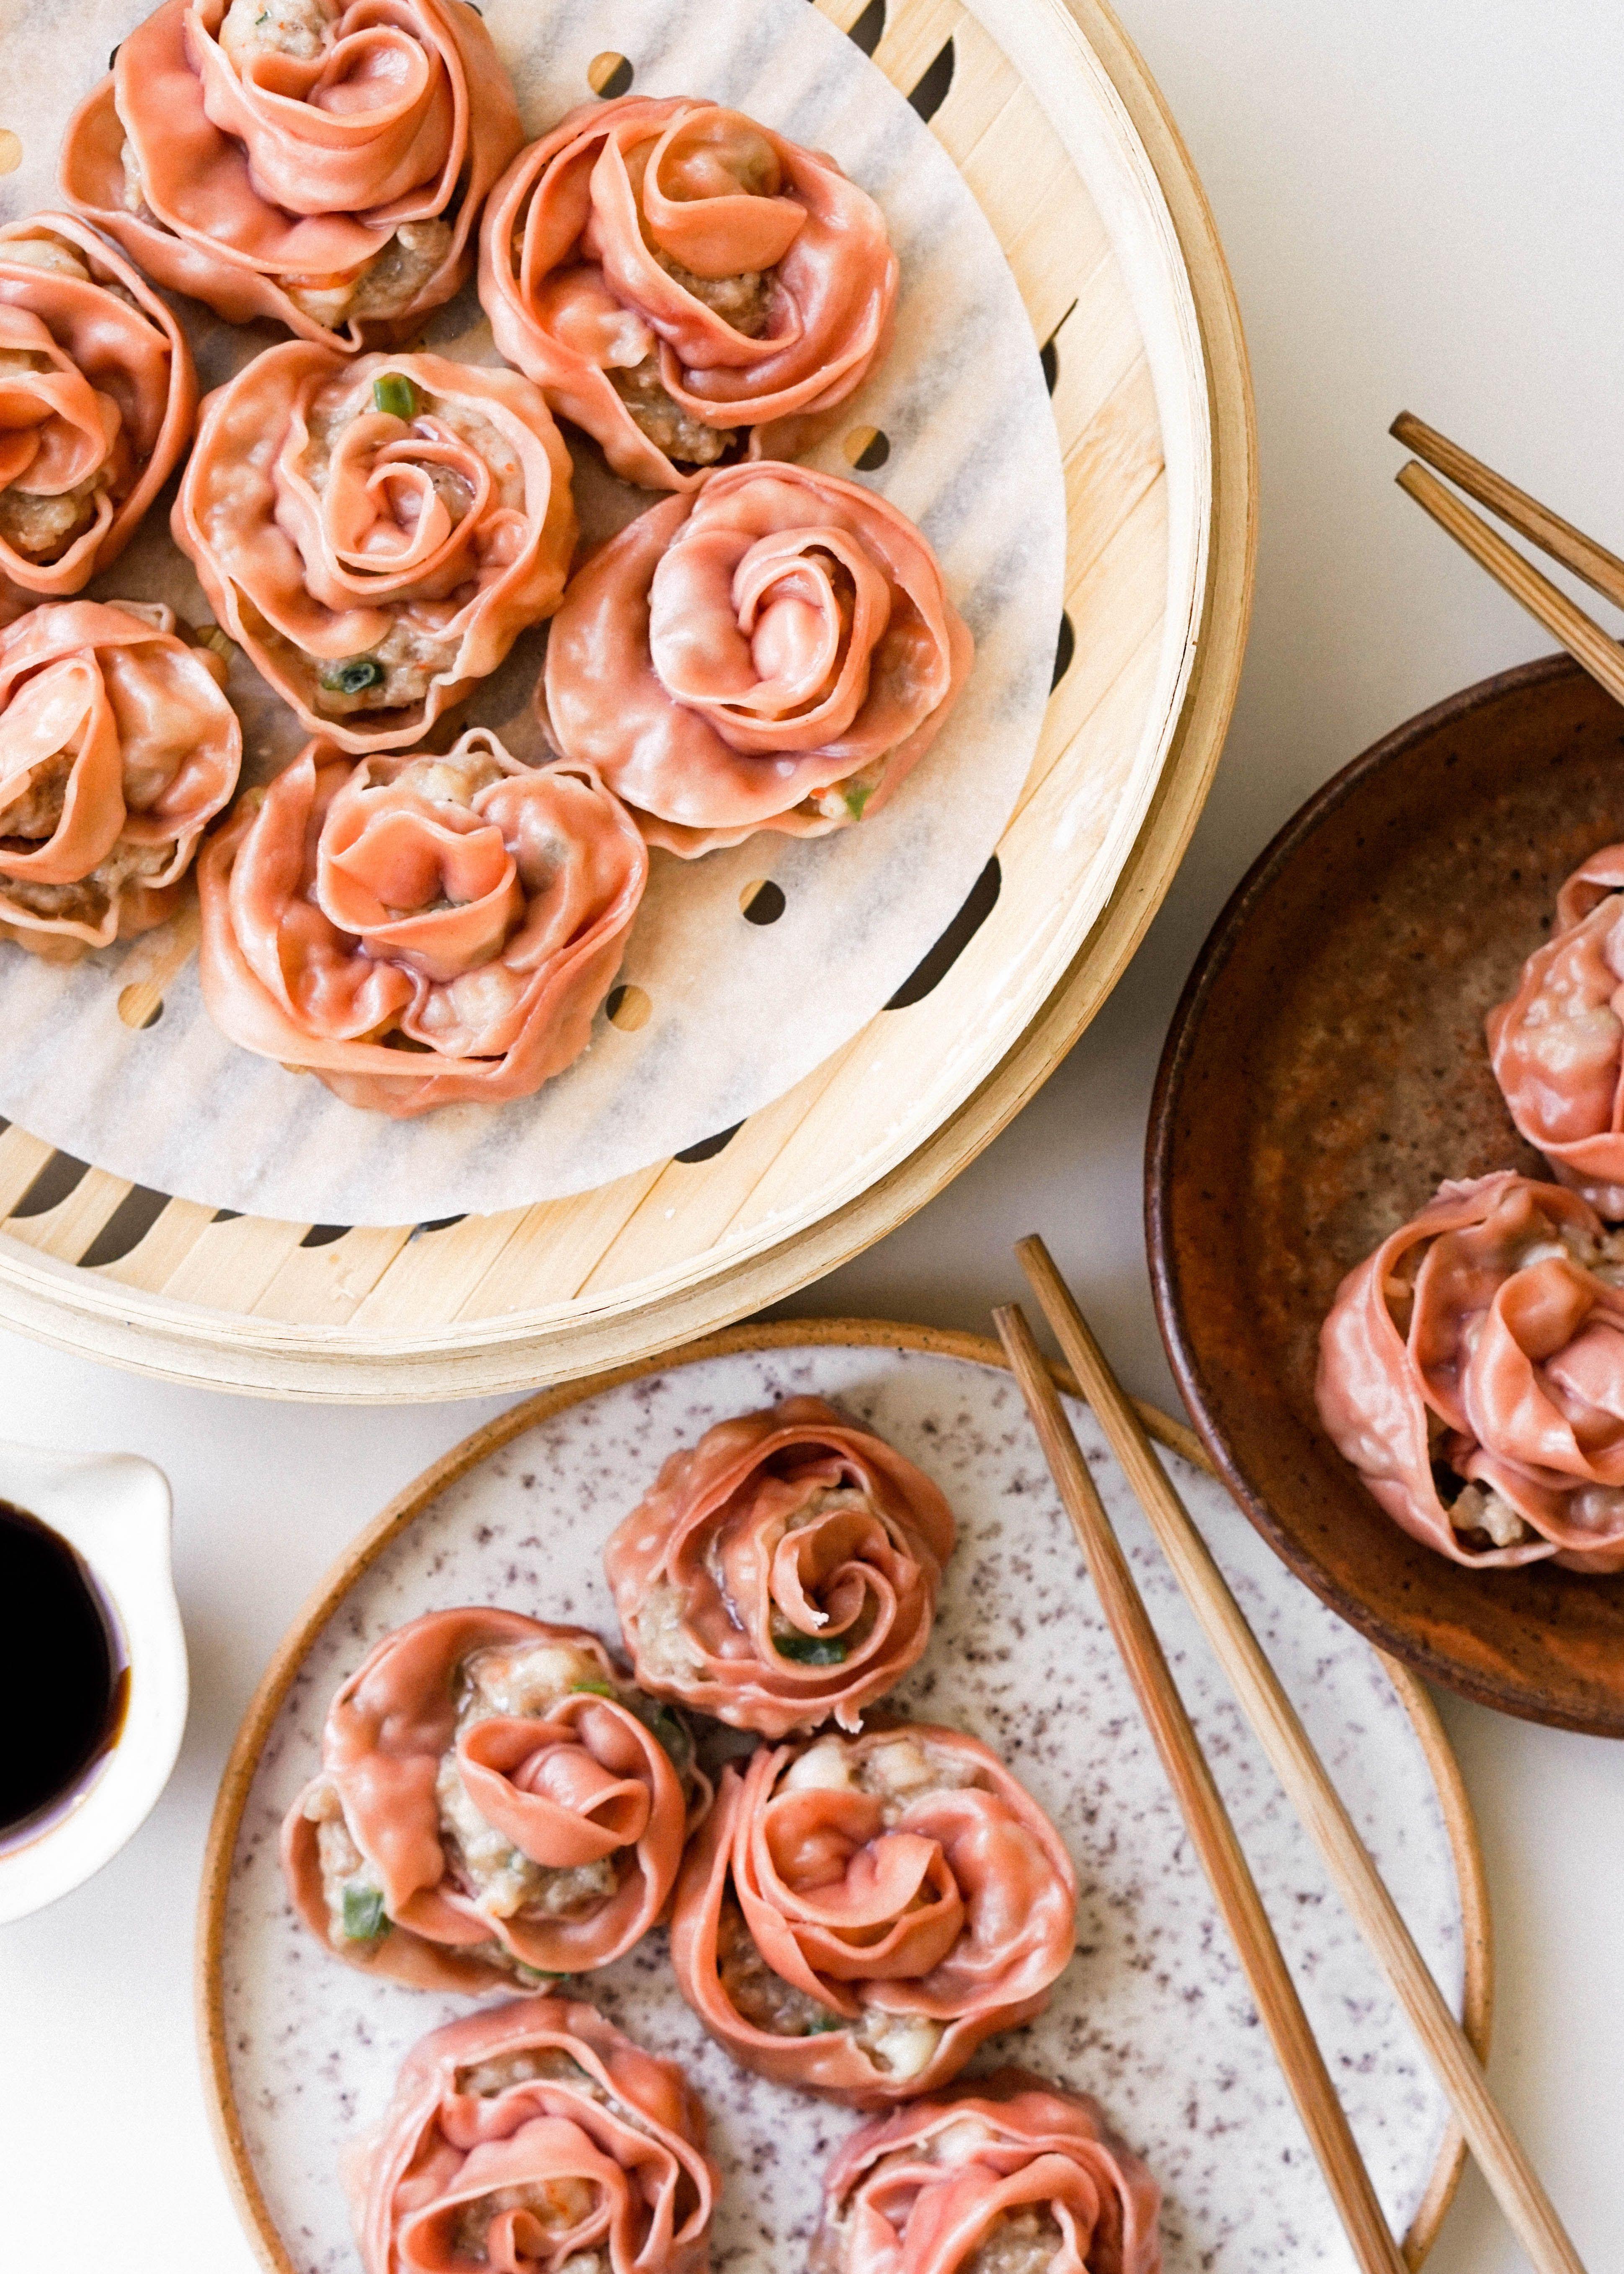 Pork and Shrimp Rose Dumplings